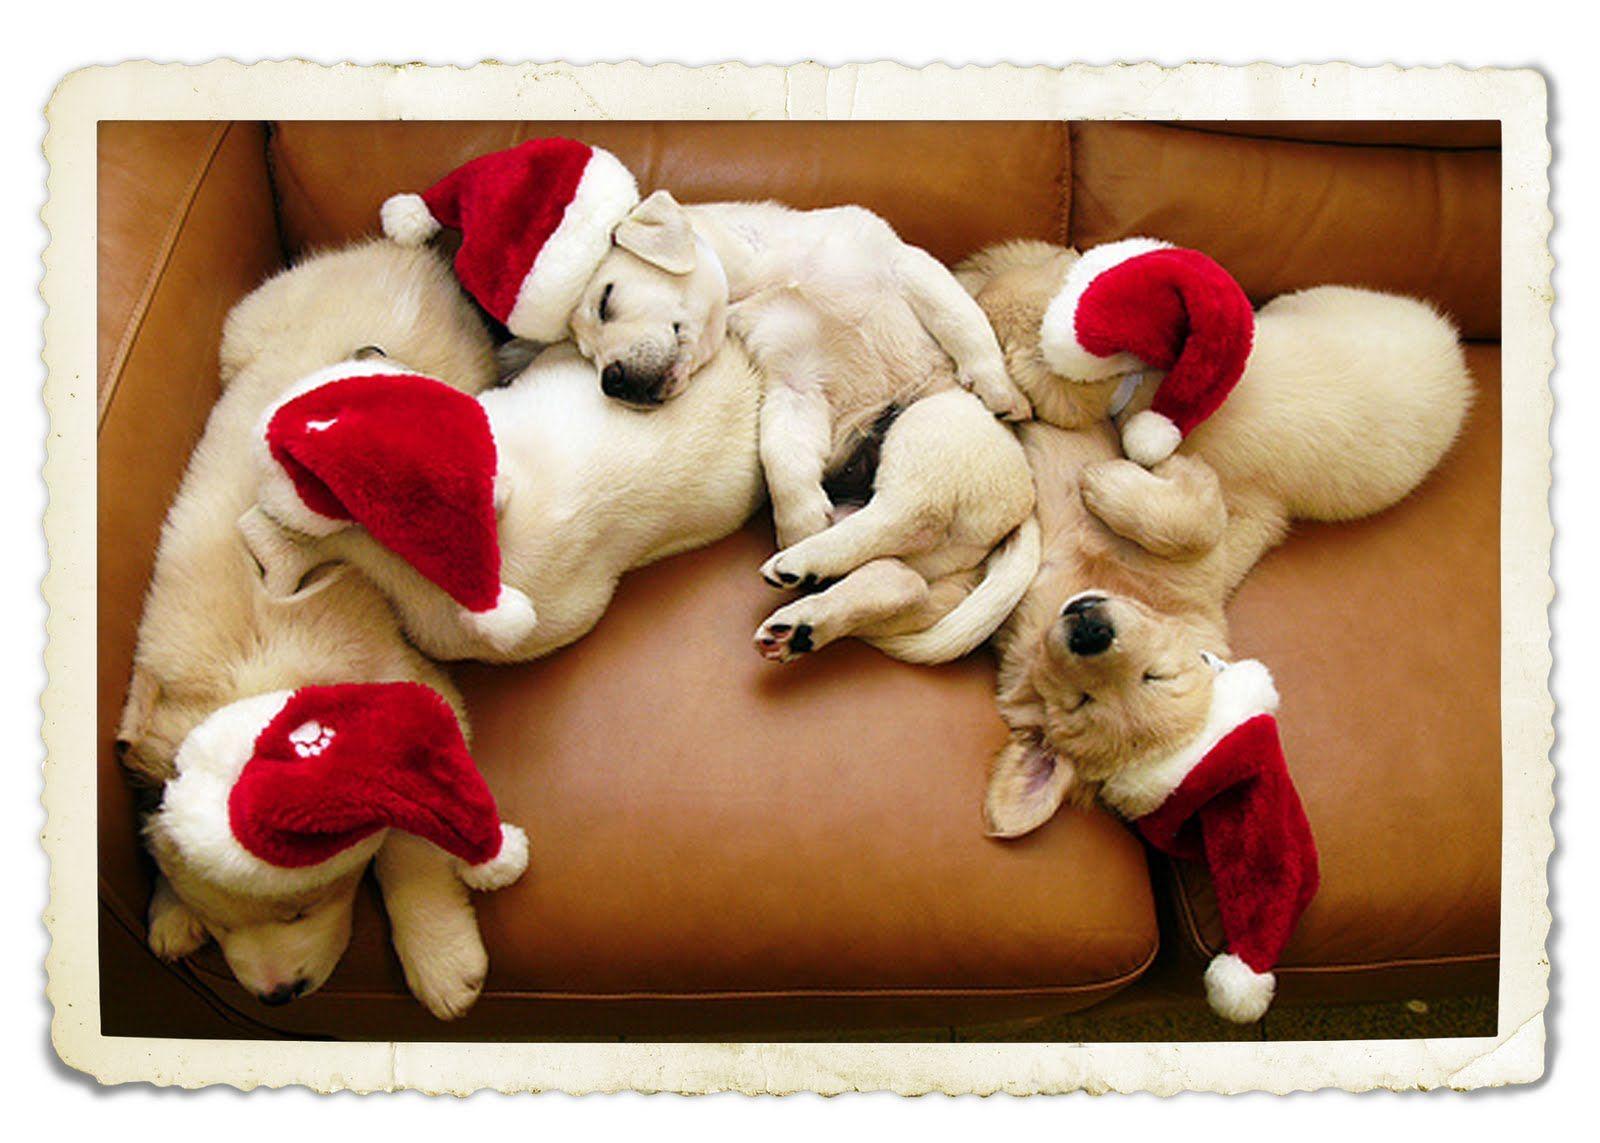 sleeping+dogs+via+tumblr.jpg (1600×1143)